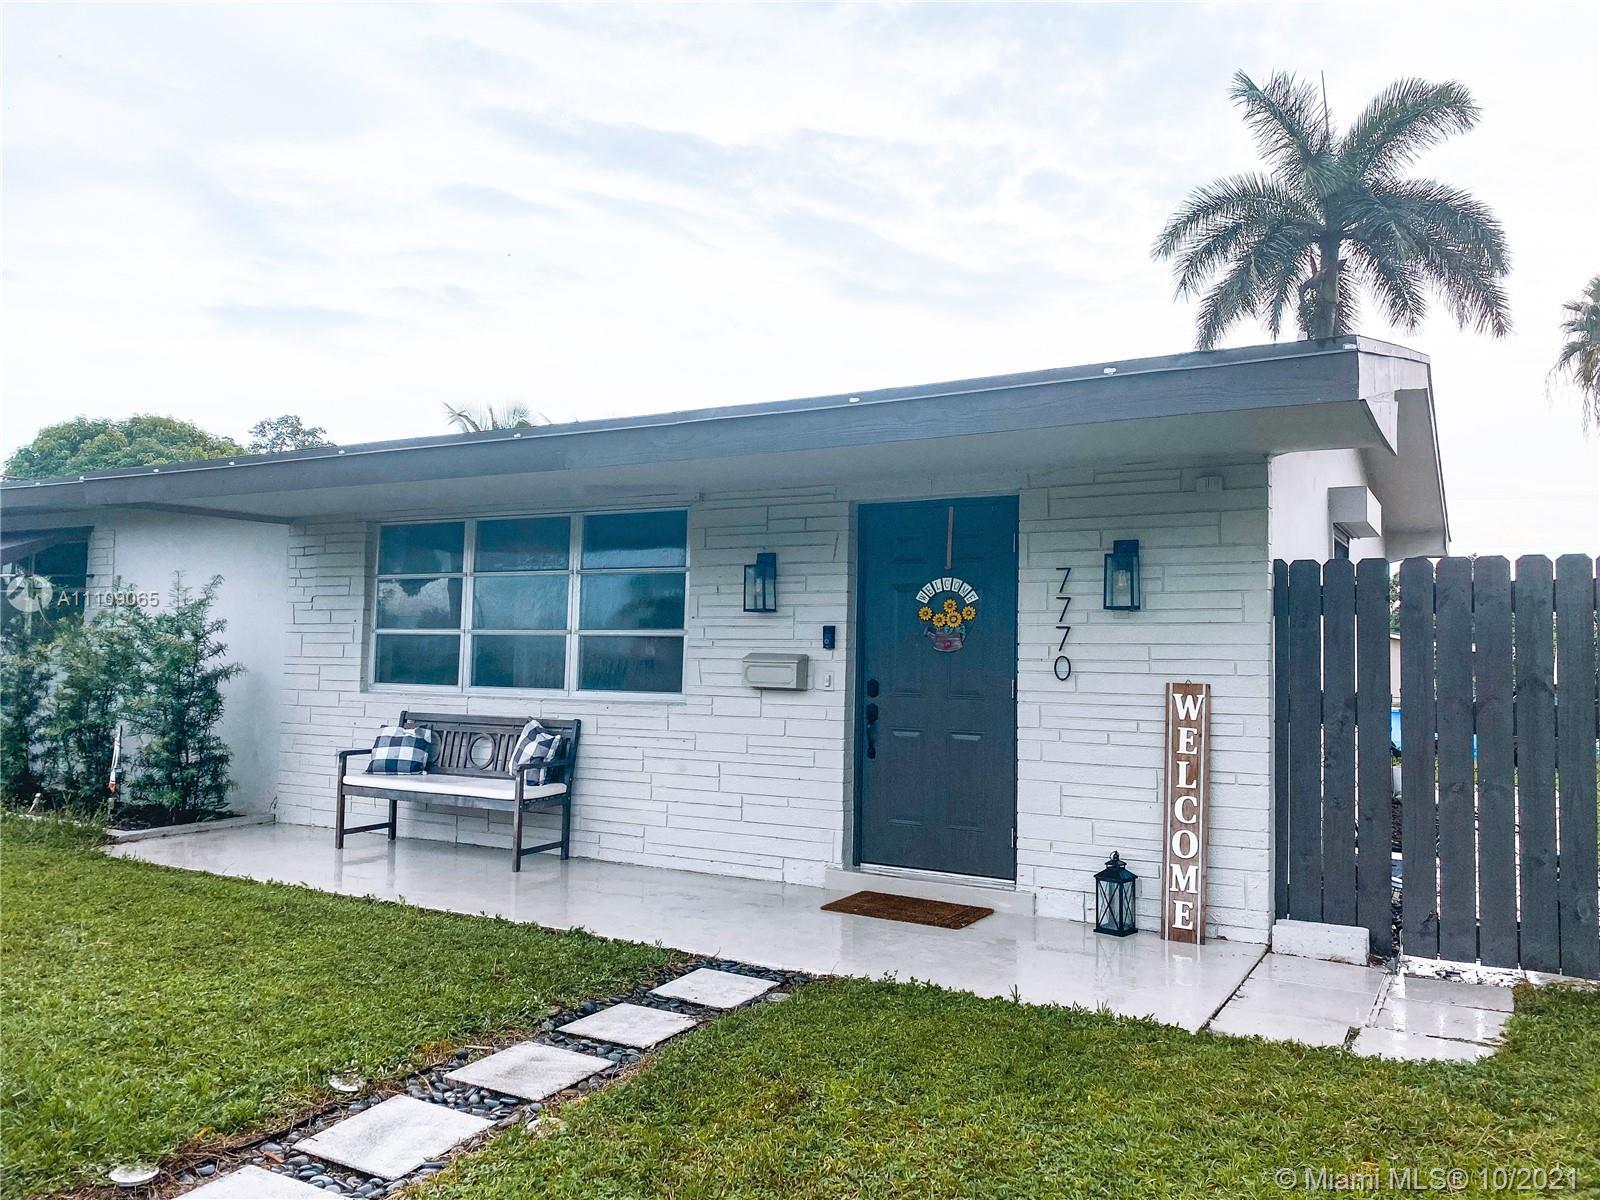 Boulevard Heights - 7770 NW 14th Street, Pembroke Pines, FL 33024